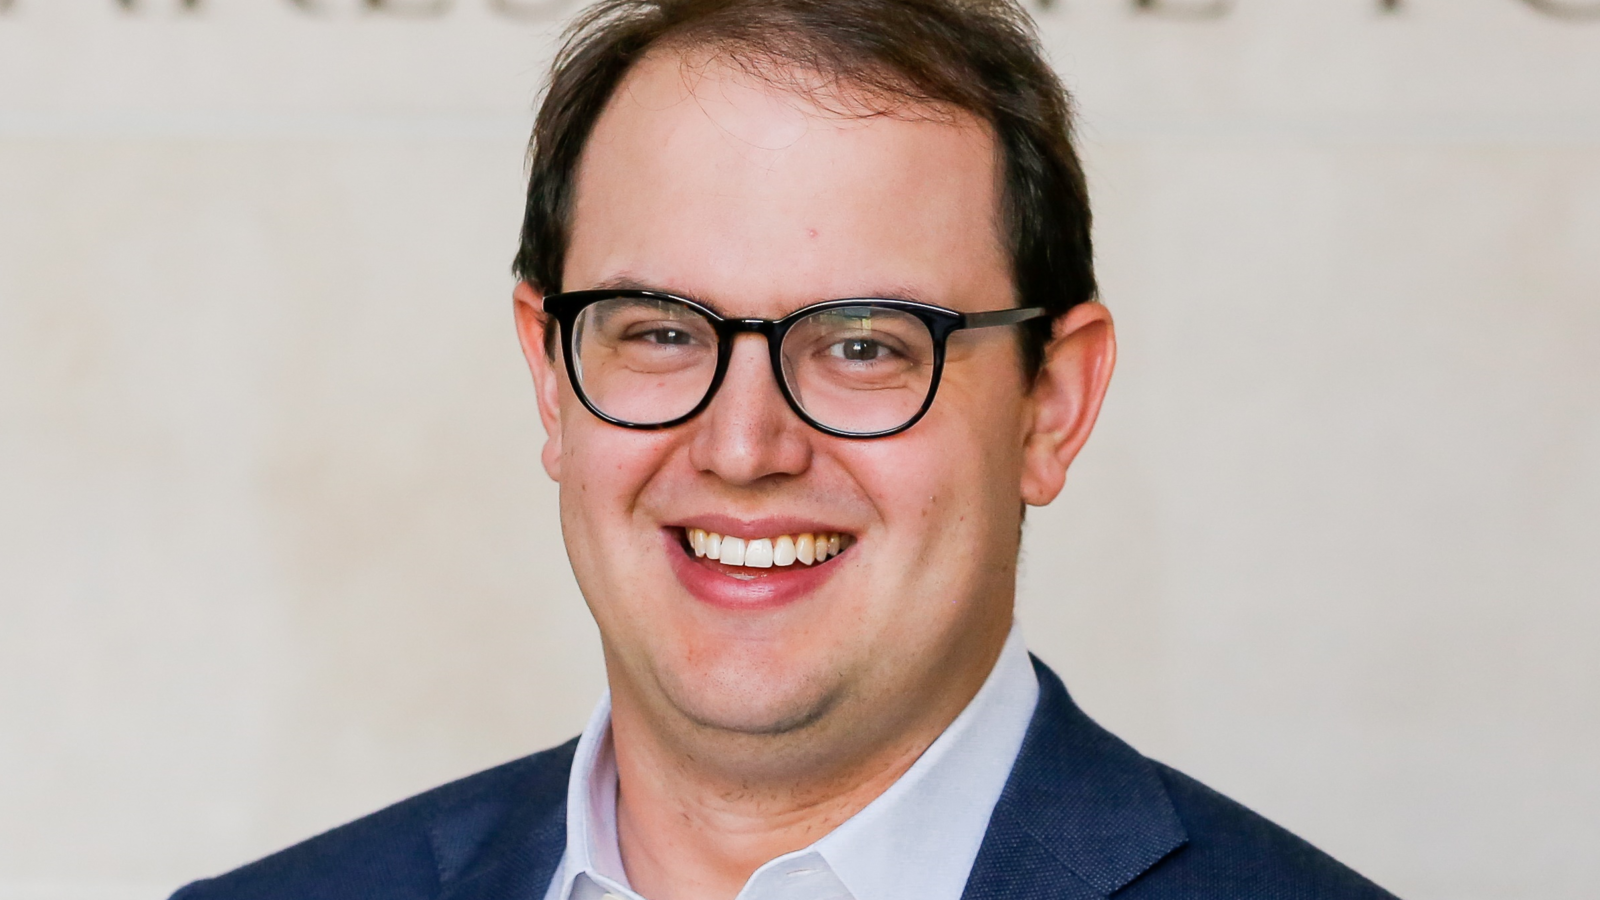 Headshot of Ben Buchanan